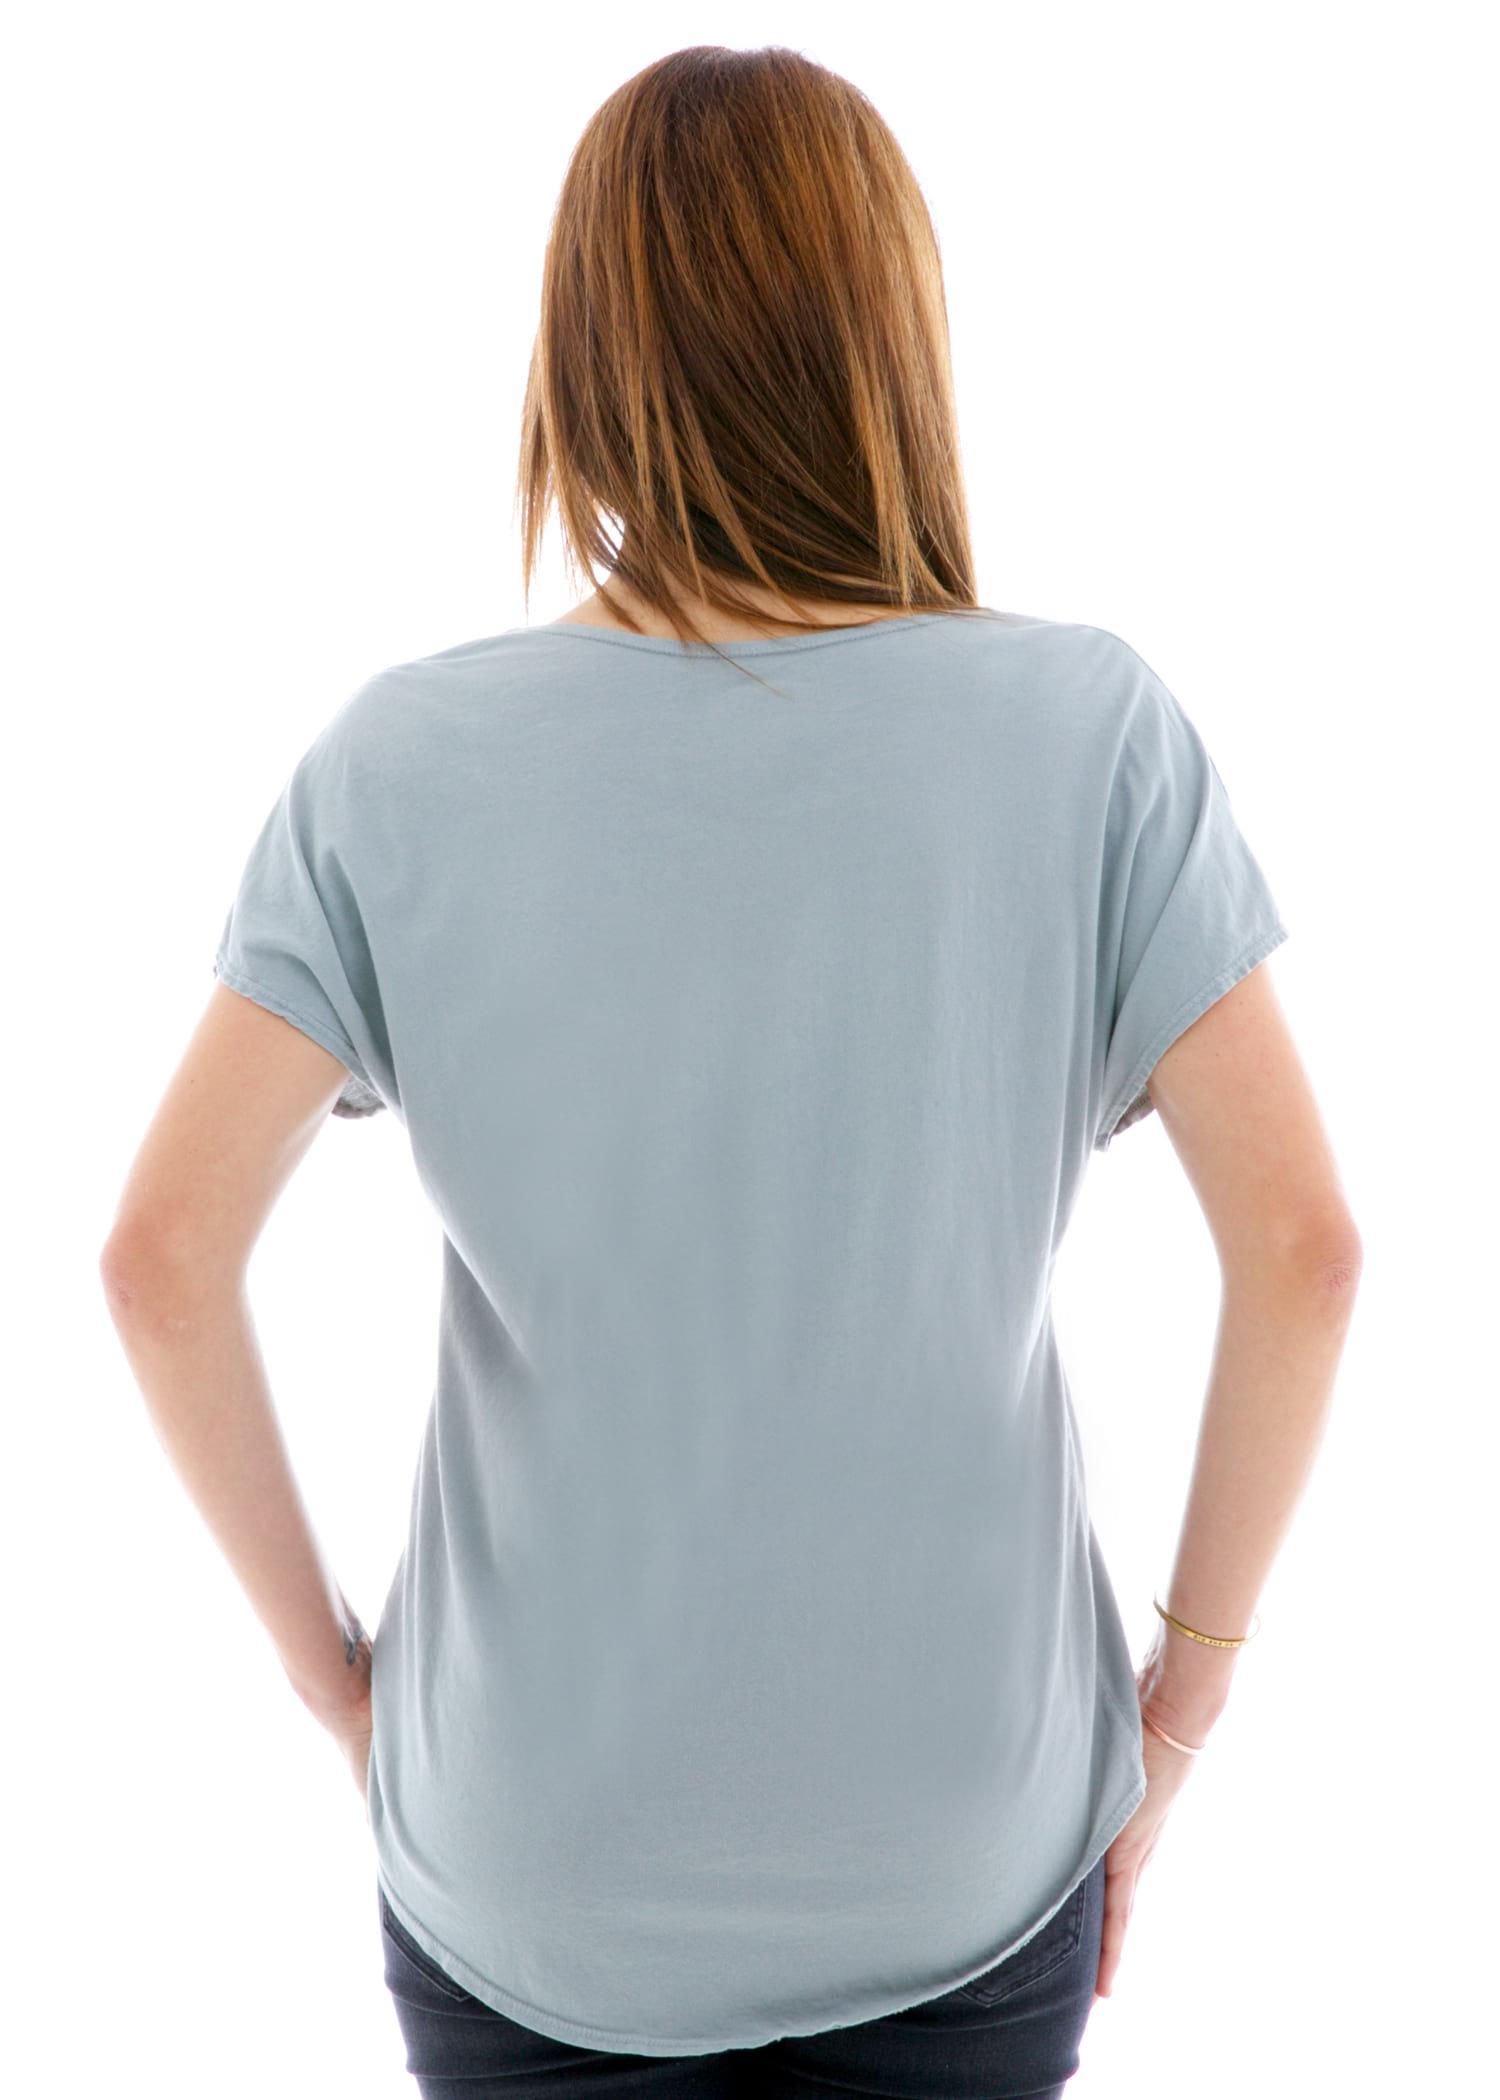 Sleeveless Dolman Short Sleeve T-Shirt Back View